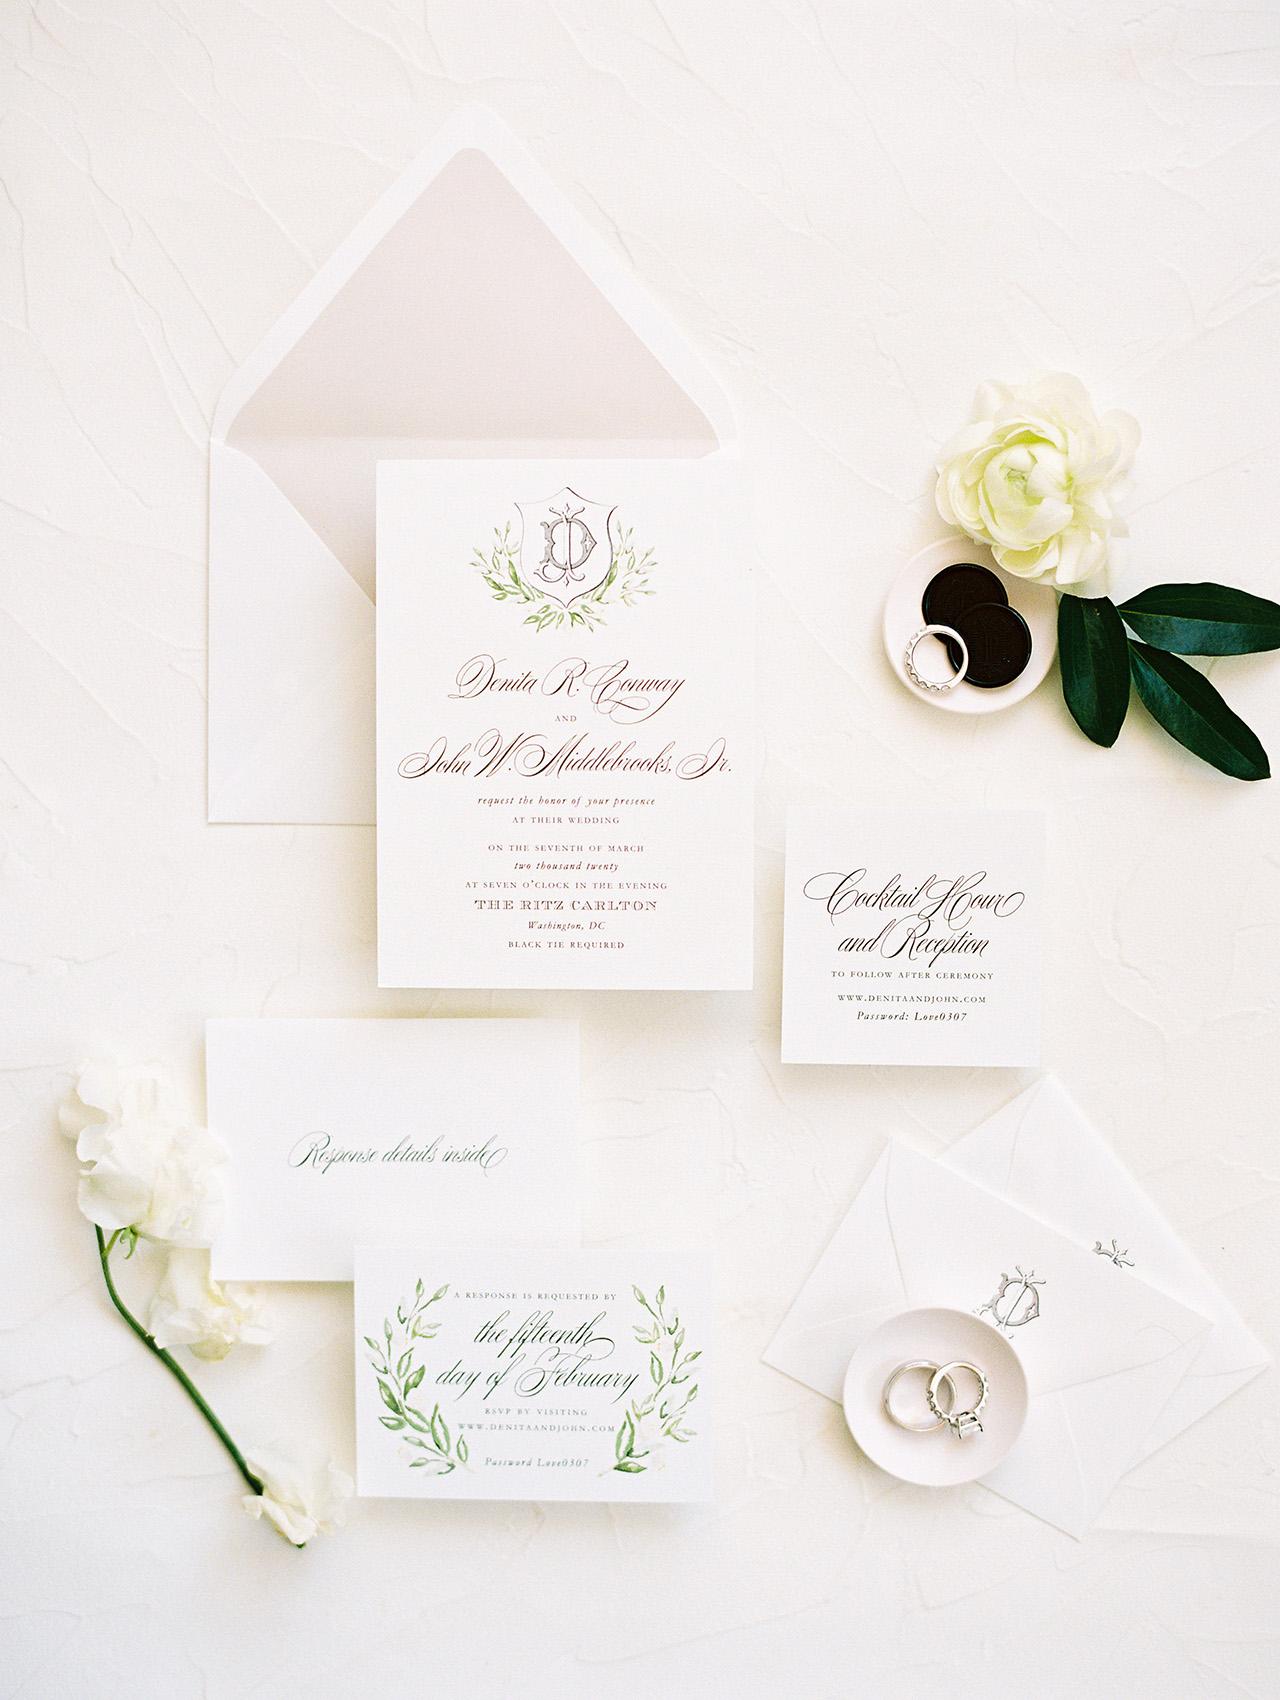 denita john wedding invites